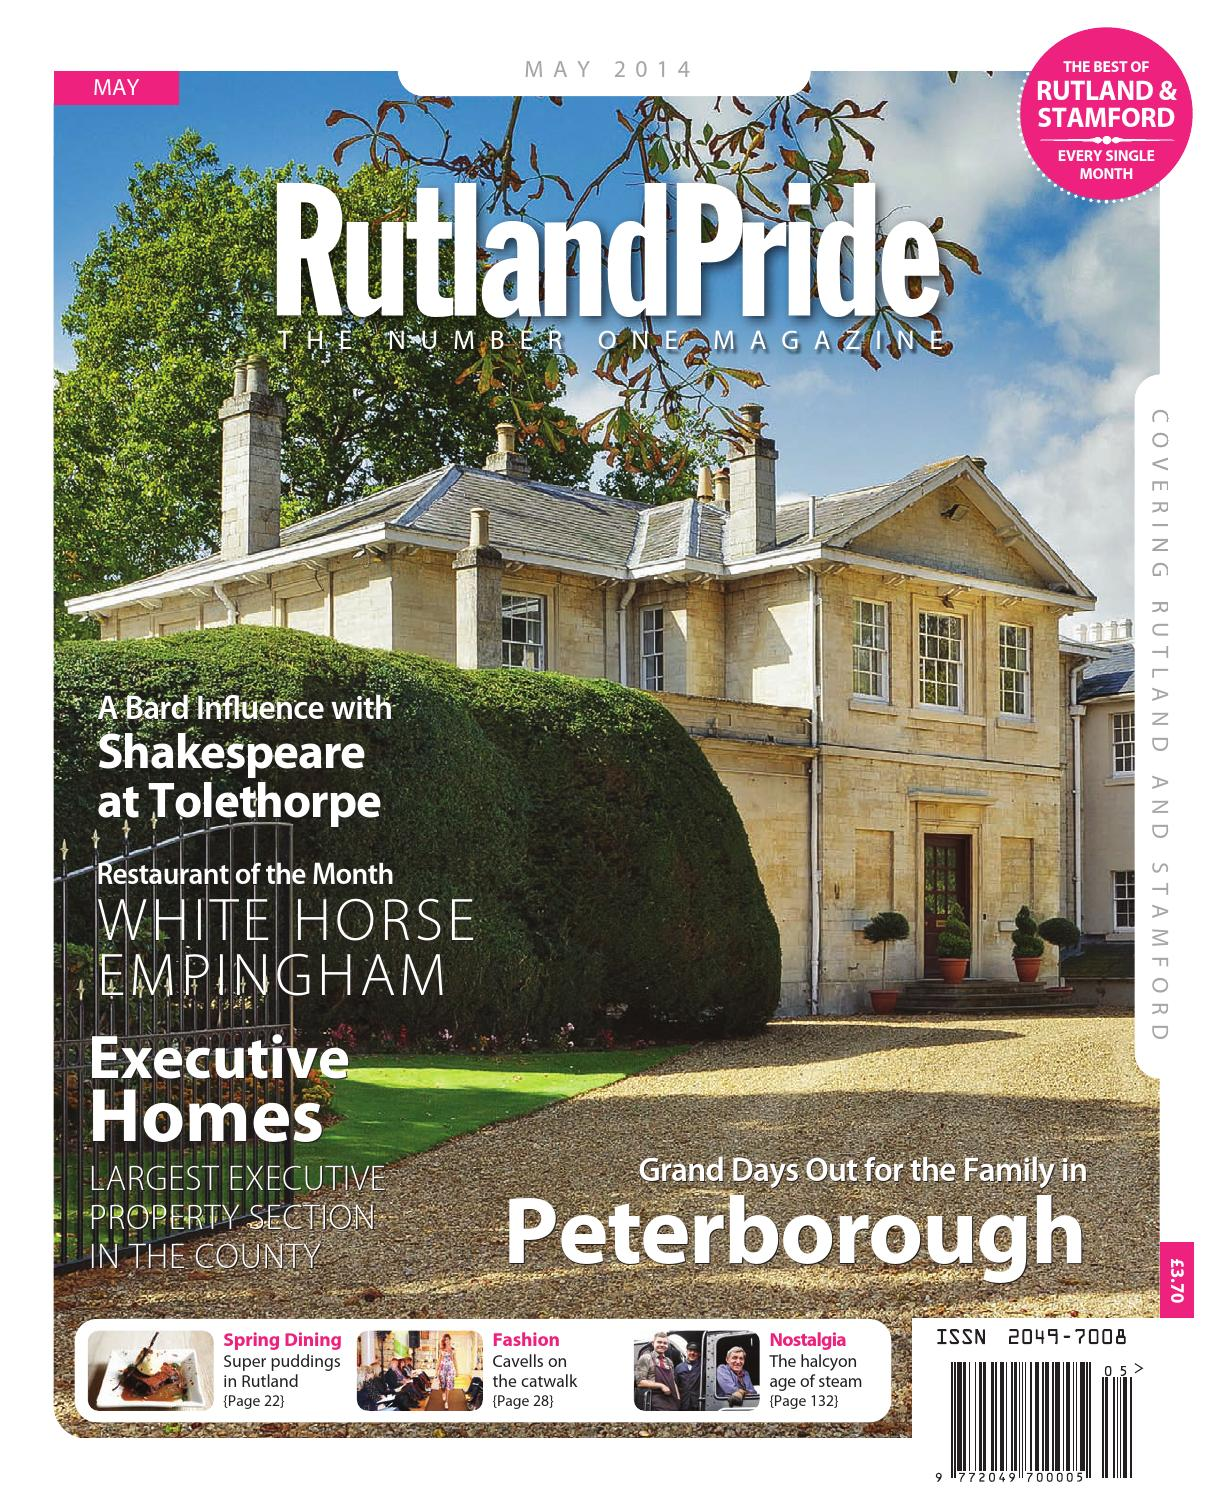 Rutland Pride May 2014 By Magazines Ltd Issuu Clarette Wedges Cordelia Black